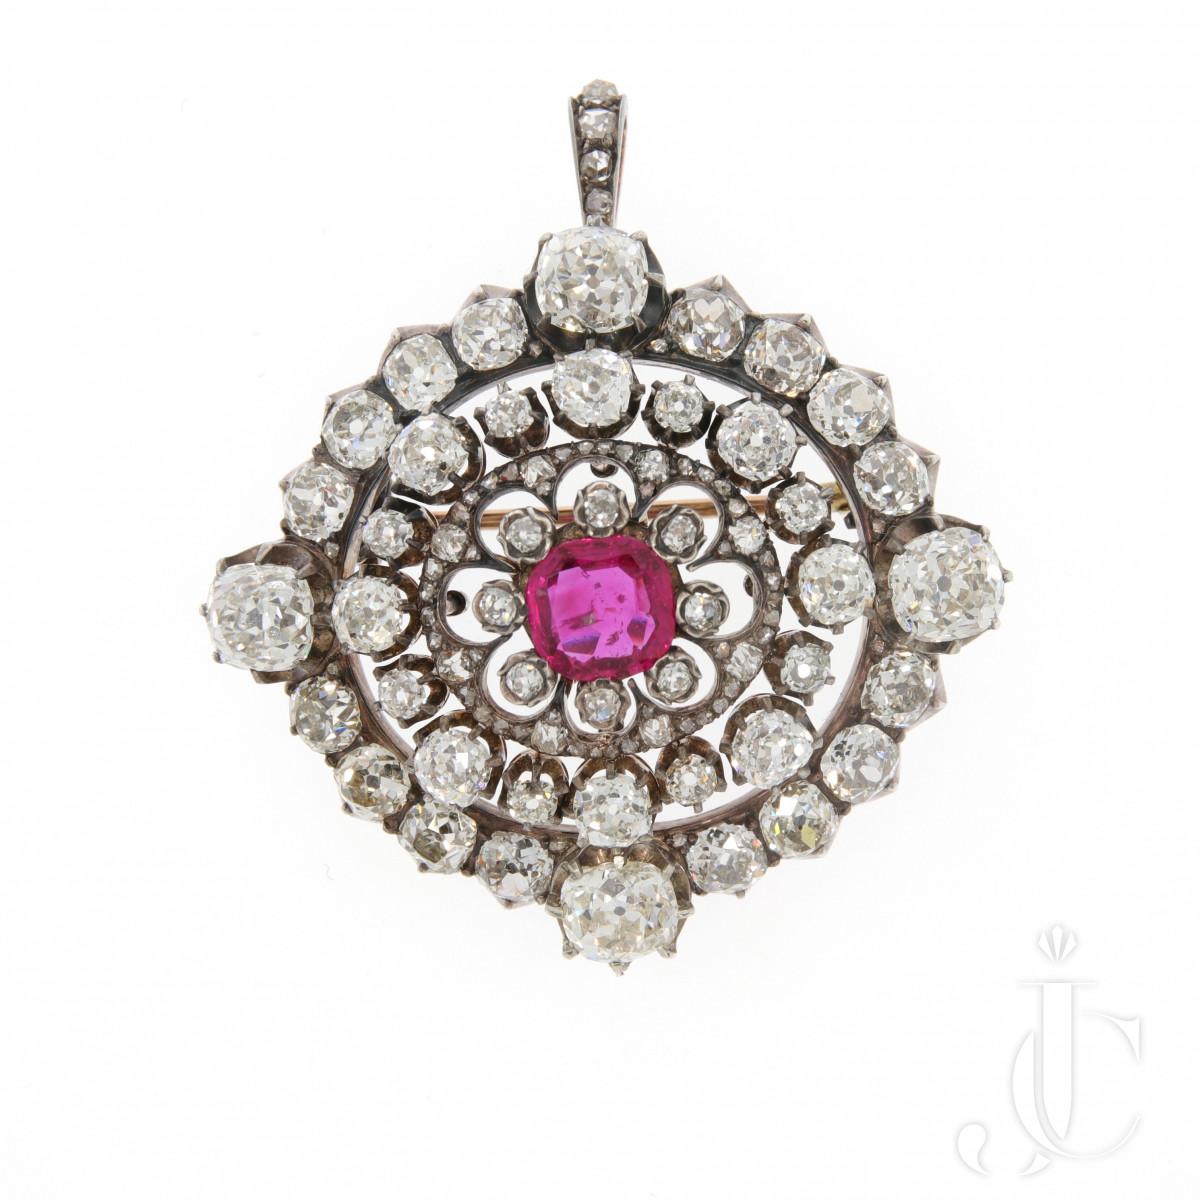 Diamond and Ruby Pendant/Brooch